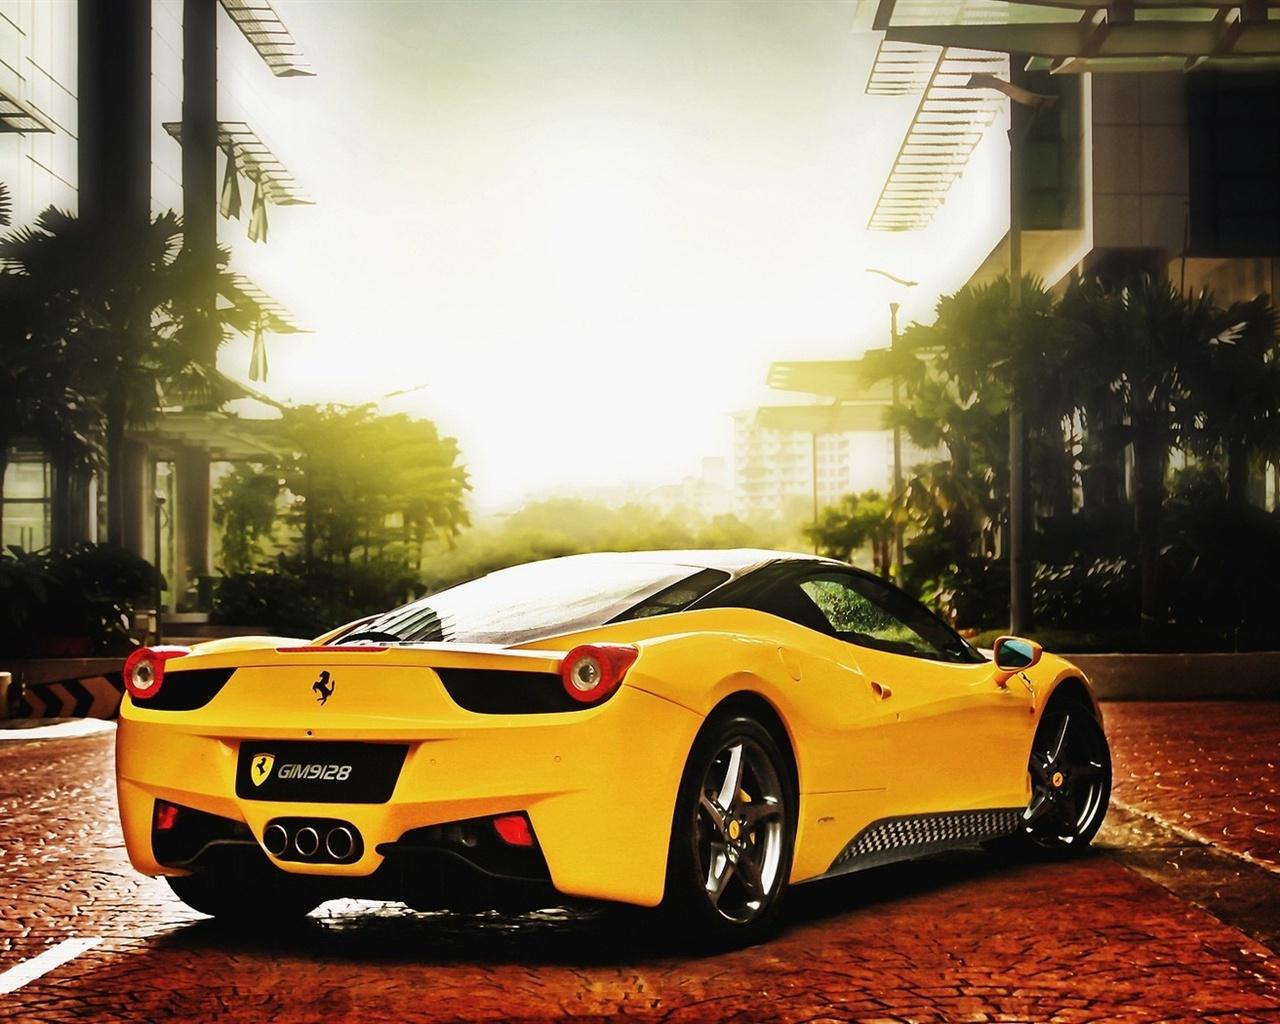 Wallpaper Ferrari Cars Of Yellow Color 1680x1050 Hd Picture